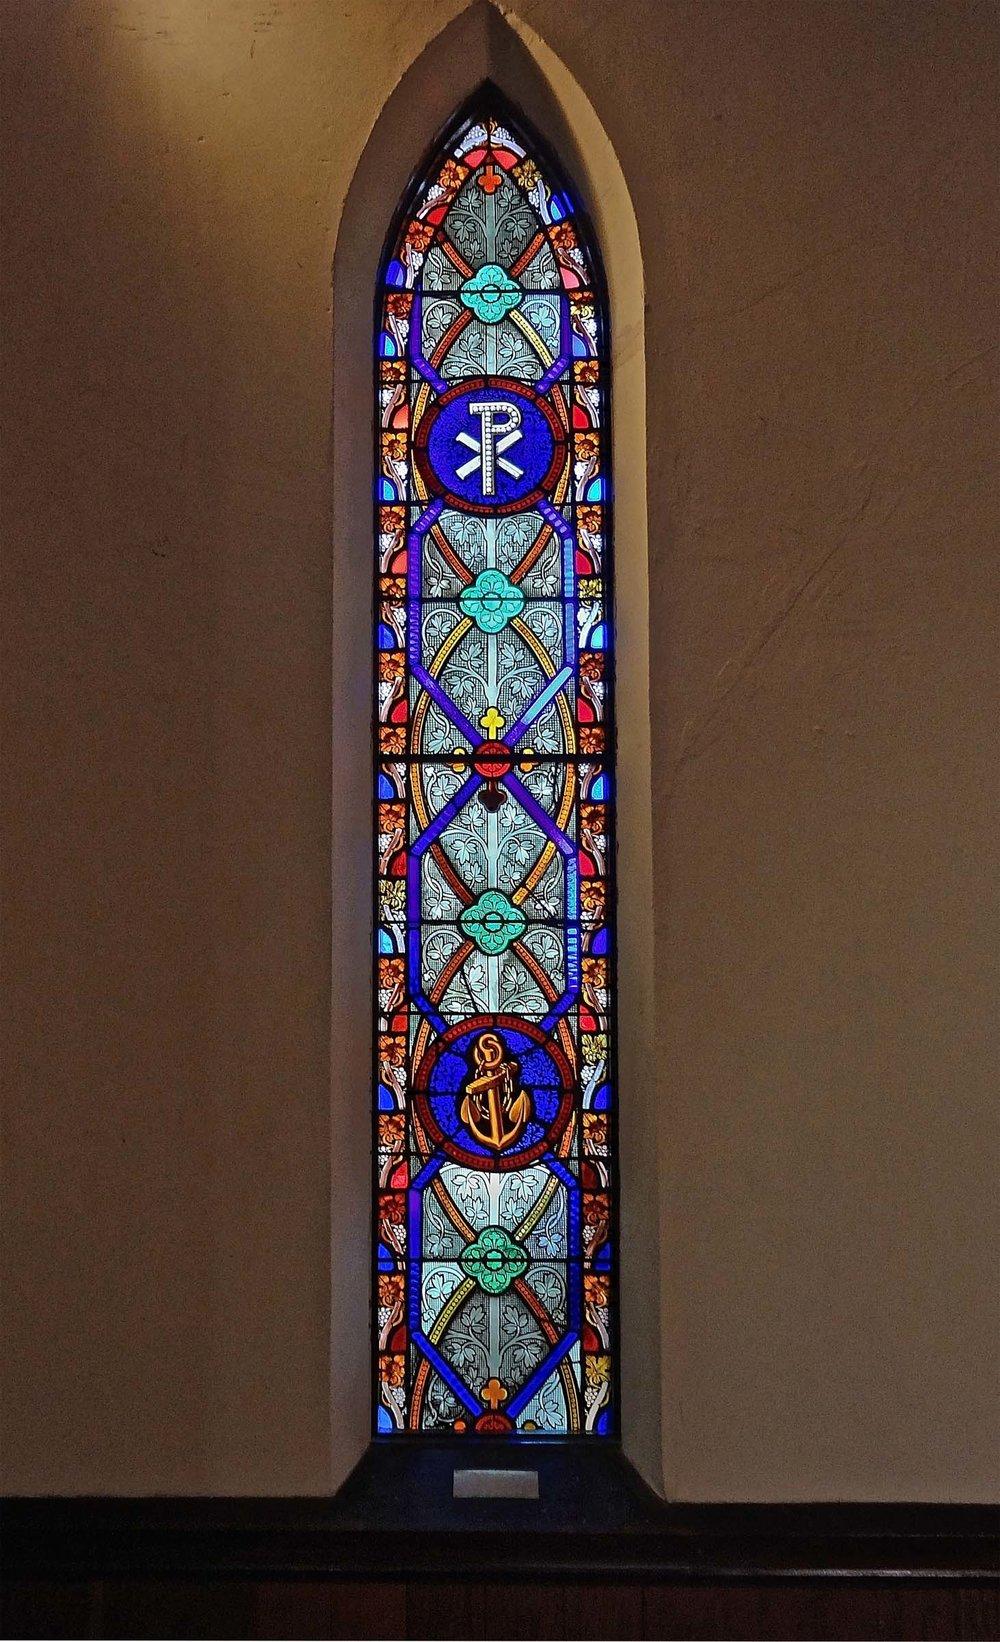 The restored window